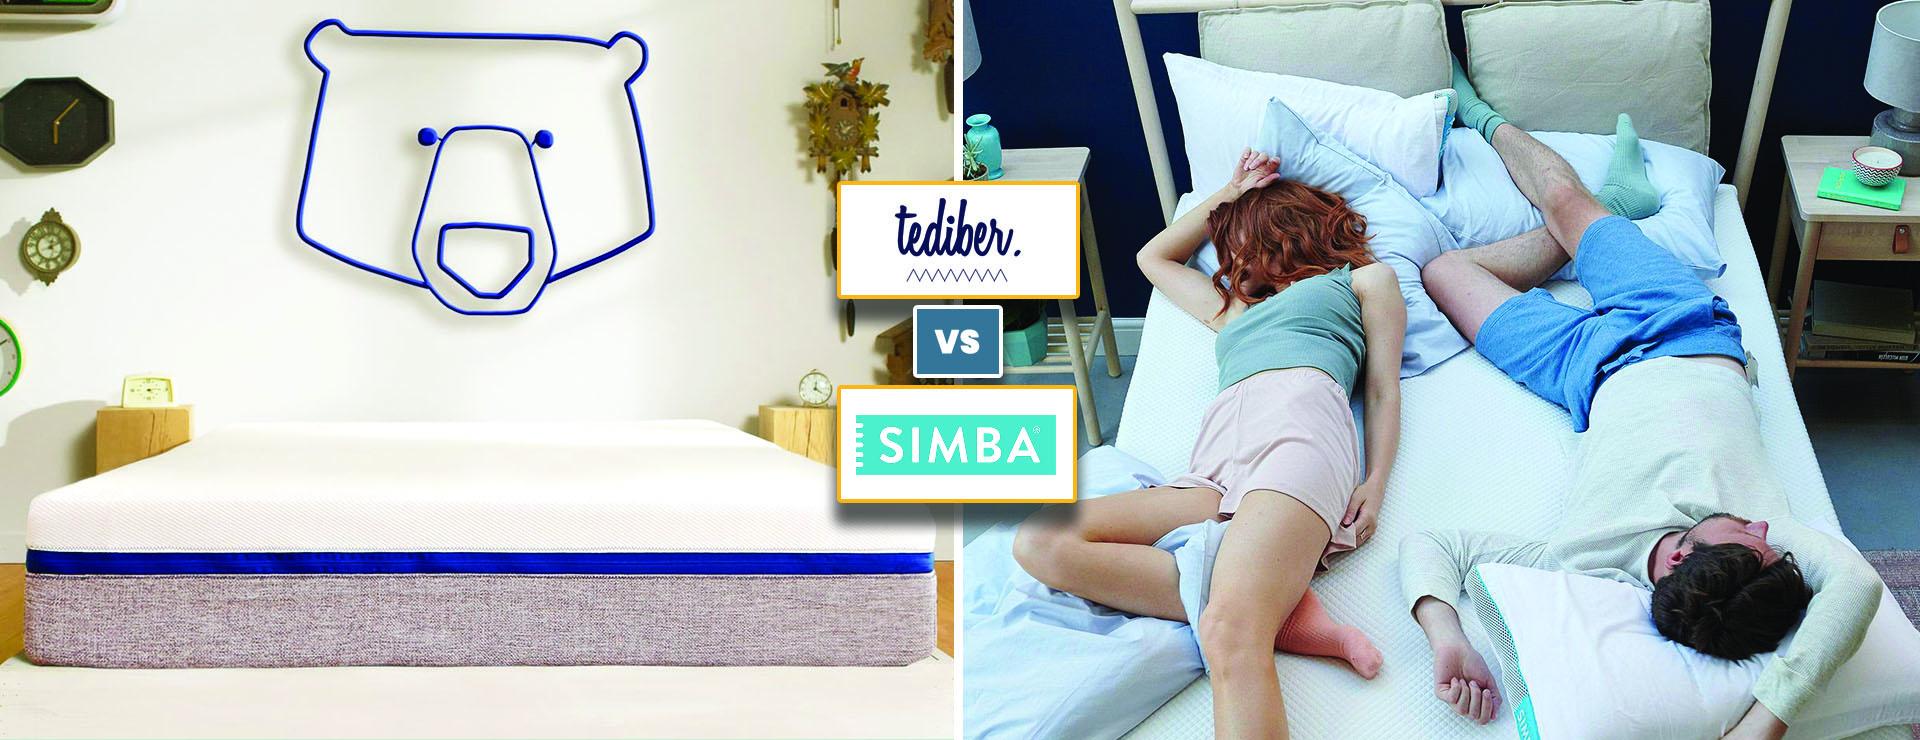 Comparatif Tediber vs Simba